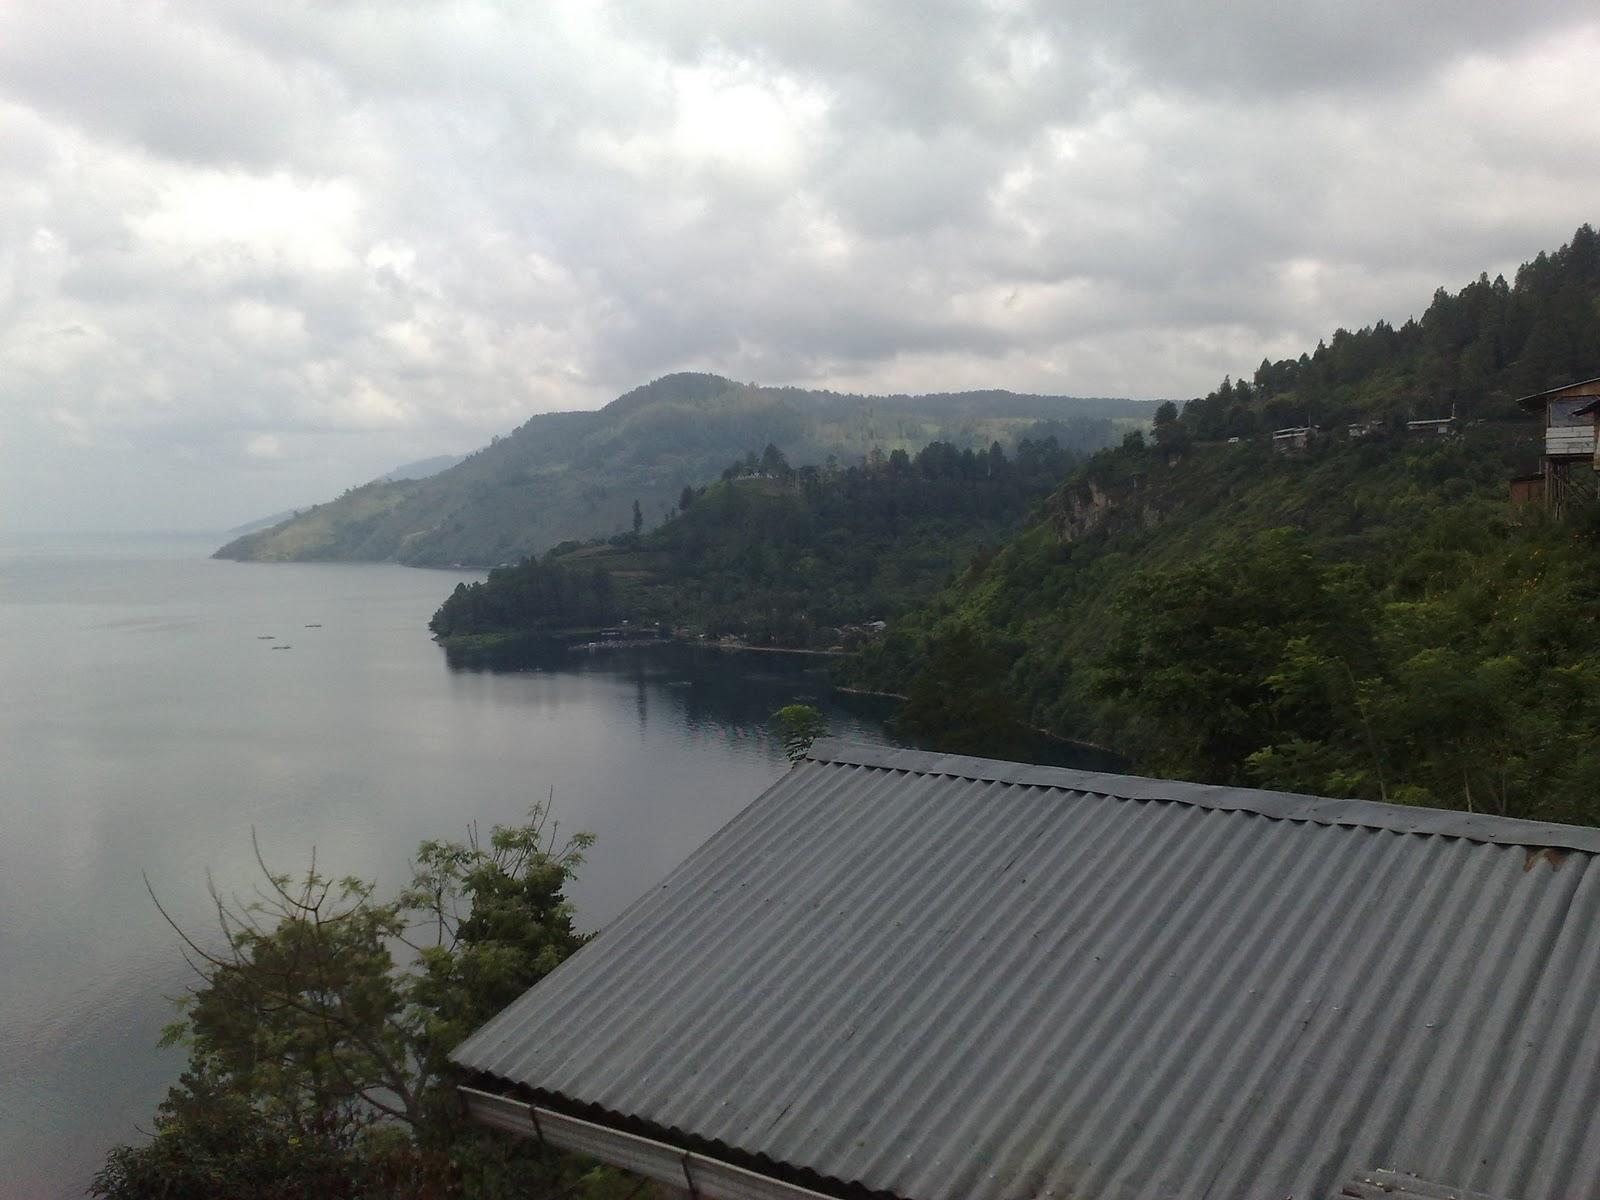 Pemandangan danau Toba dari kawasan Panatapan